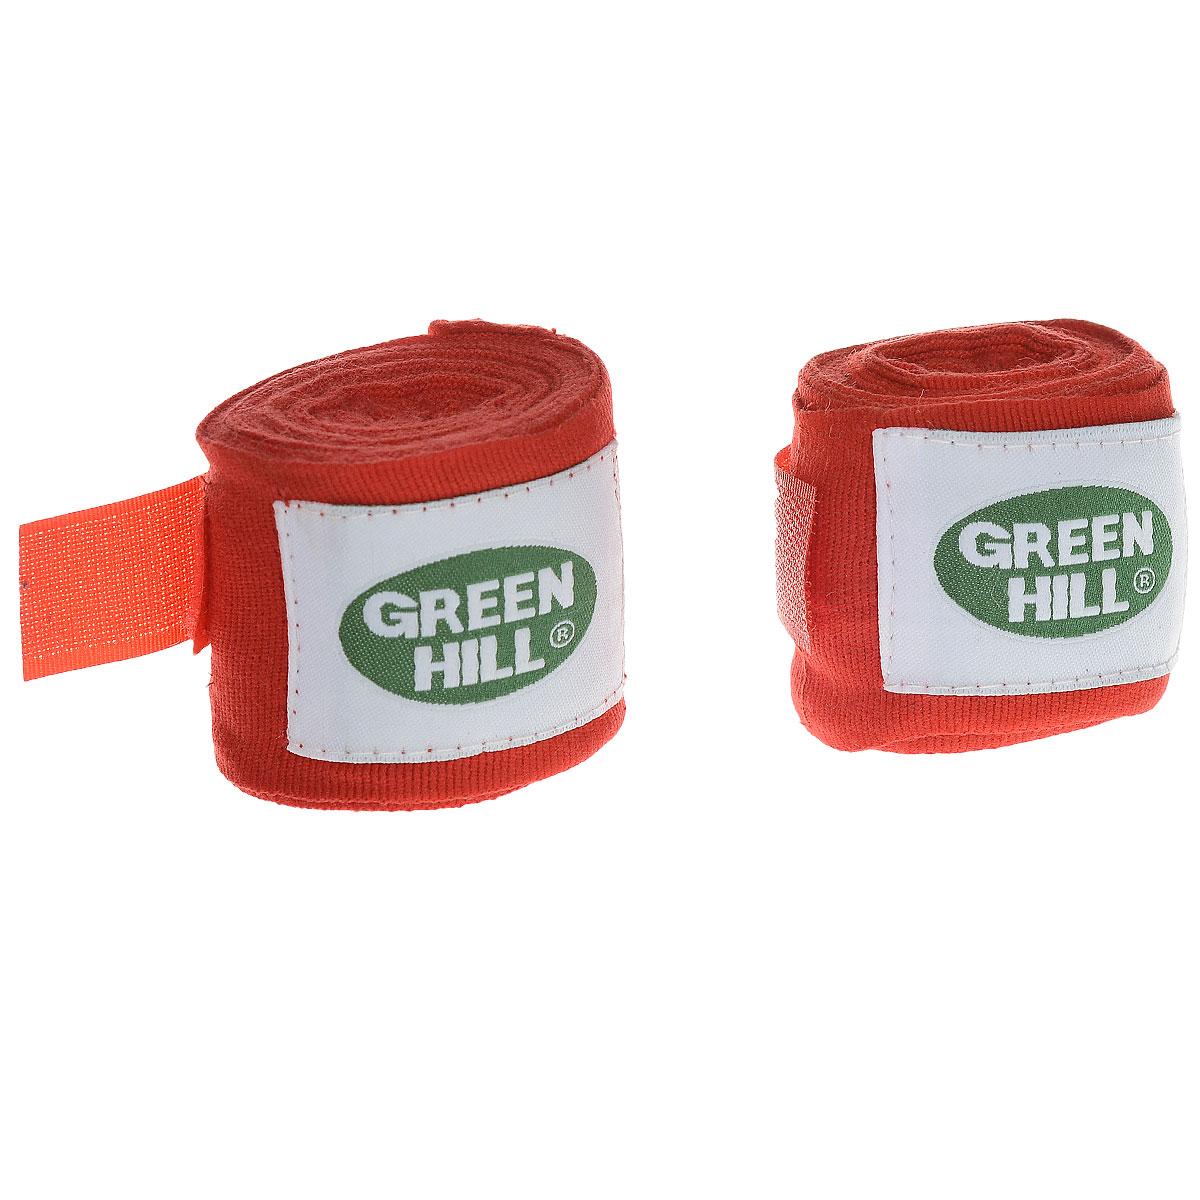 "Green Hill Бинты боксерские ""Green Hill"", эластик, цвет: красный, 3,5 м, 2 шт"